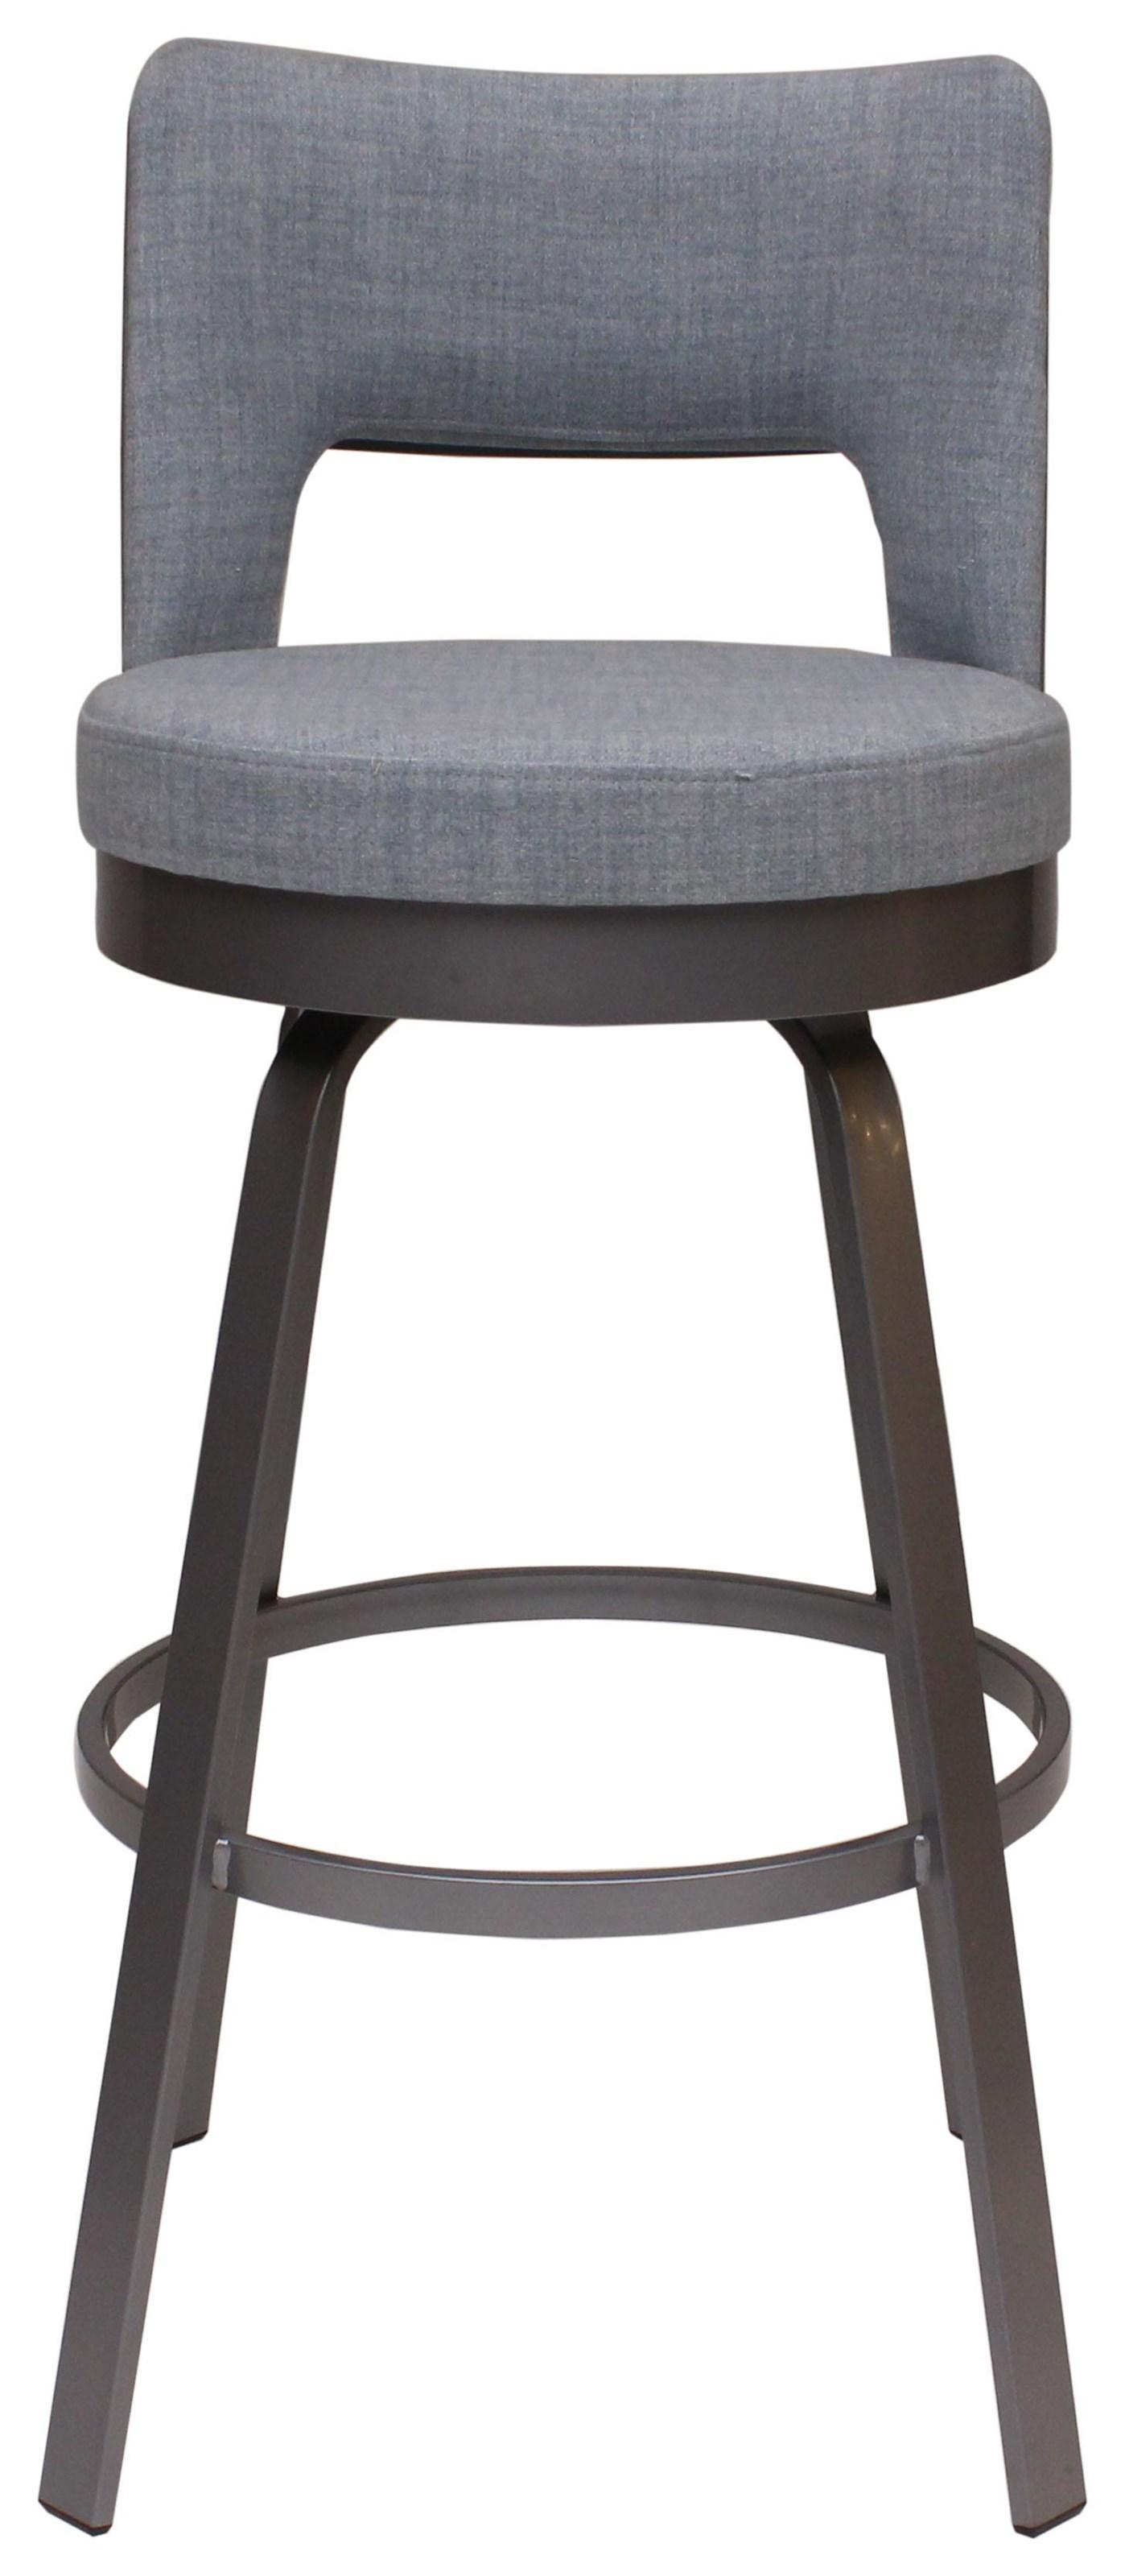 Brock Swivel Barstool by Amisco at HomeWorld Furniture